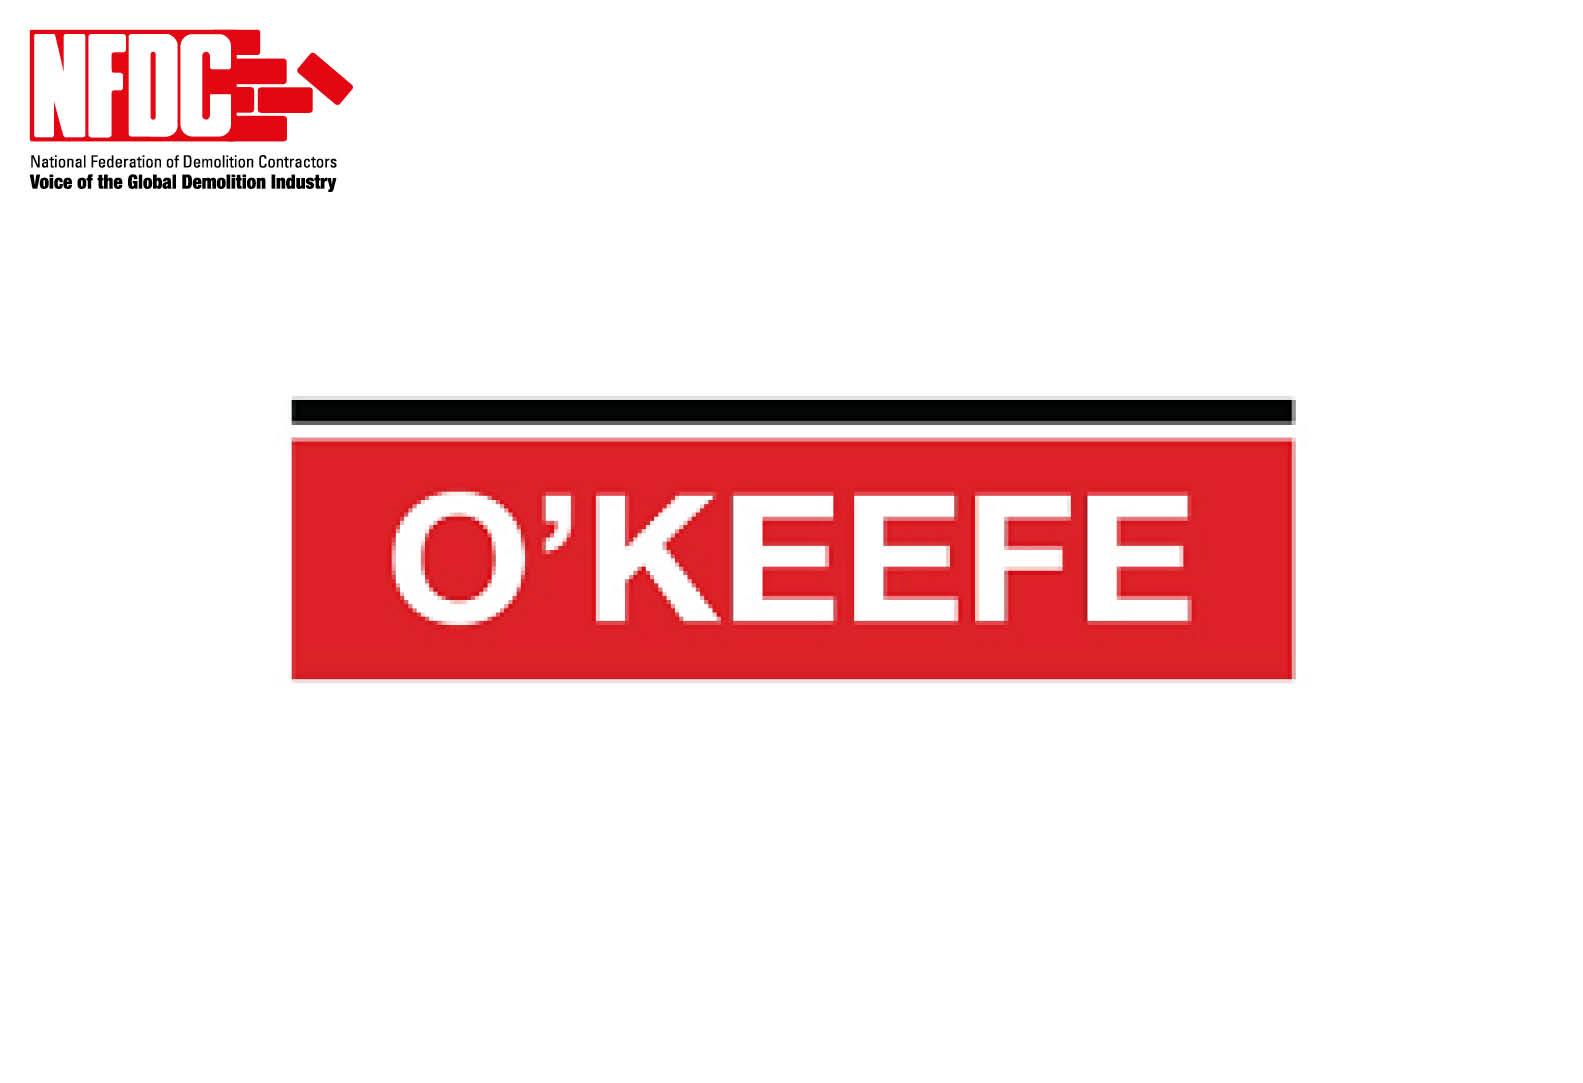 O'Keefe Demolition